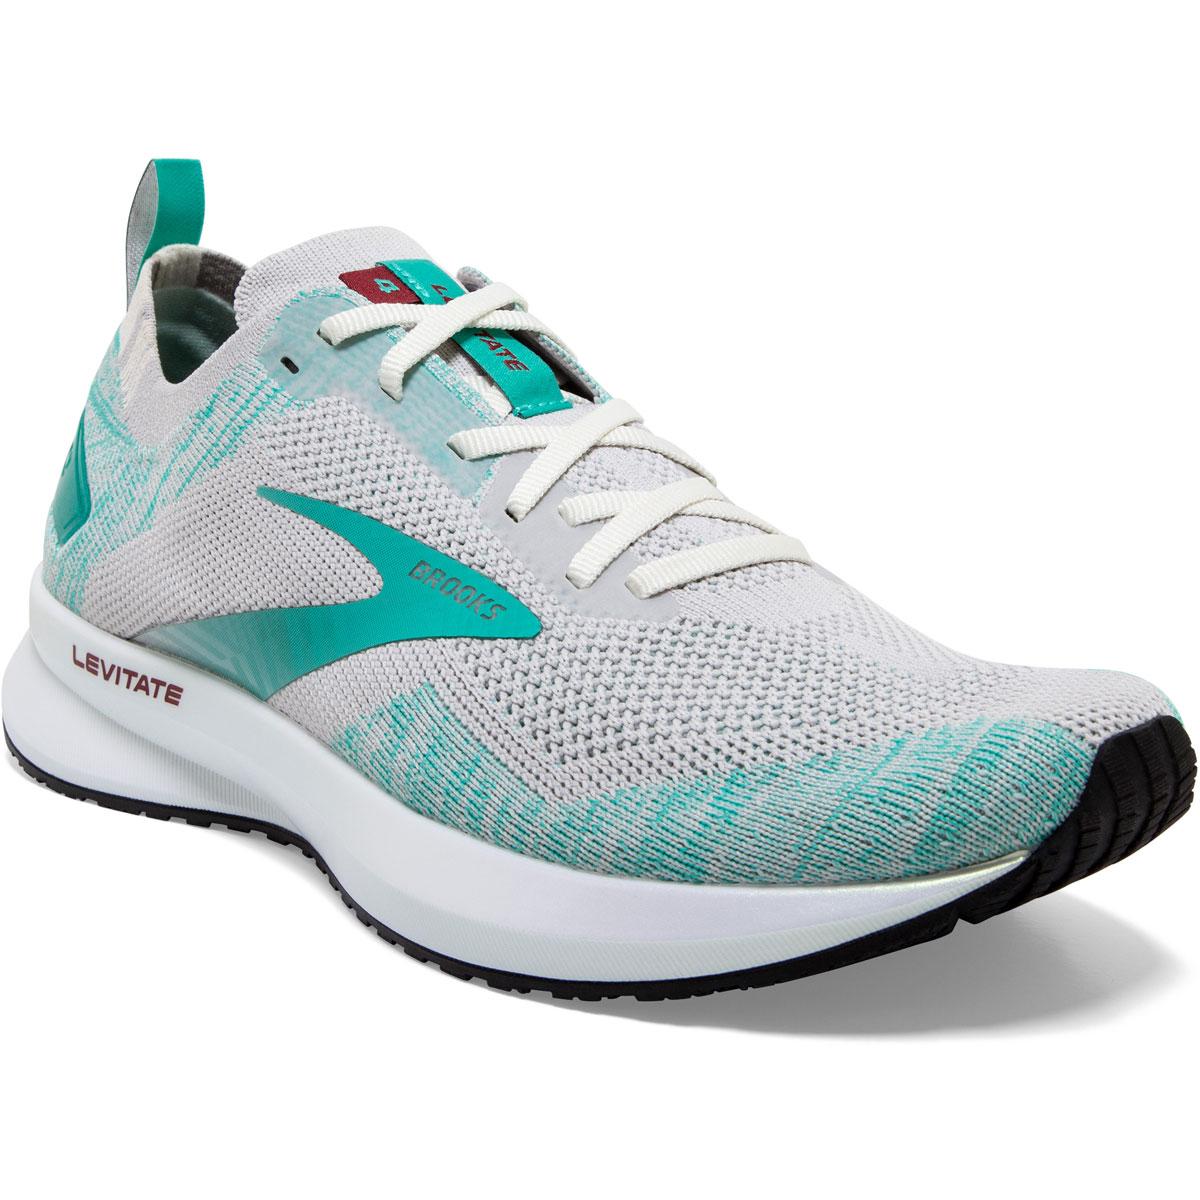 Women's Brooks Levitate 4 Running Shoe - Color: Antarctica/Atlantis/White - Size: 5.5 - Width: Regular, Antarctica/Atlantis/White, large, image 2